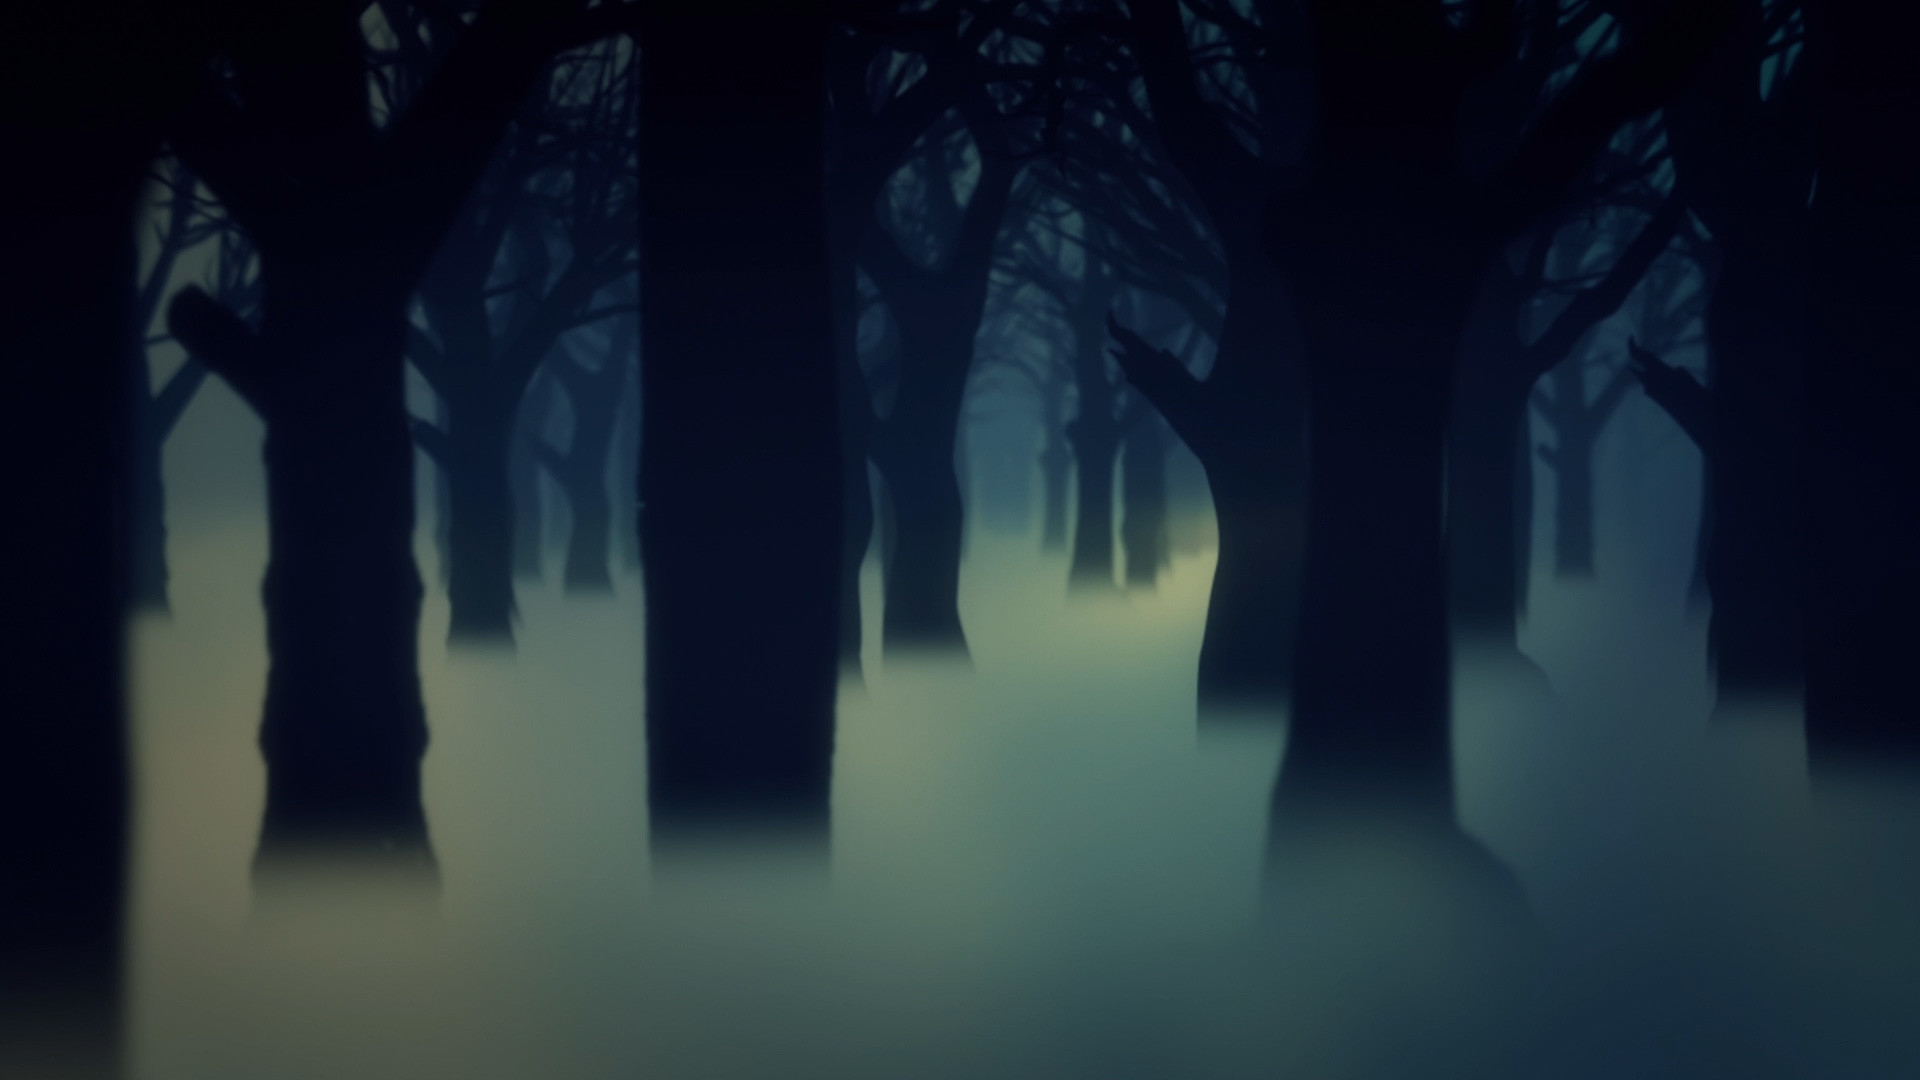 1920x1080, Dark Forest Fog Trees Animated Background - Animated Dark Forest Background - HD Wallpaper